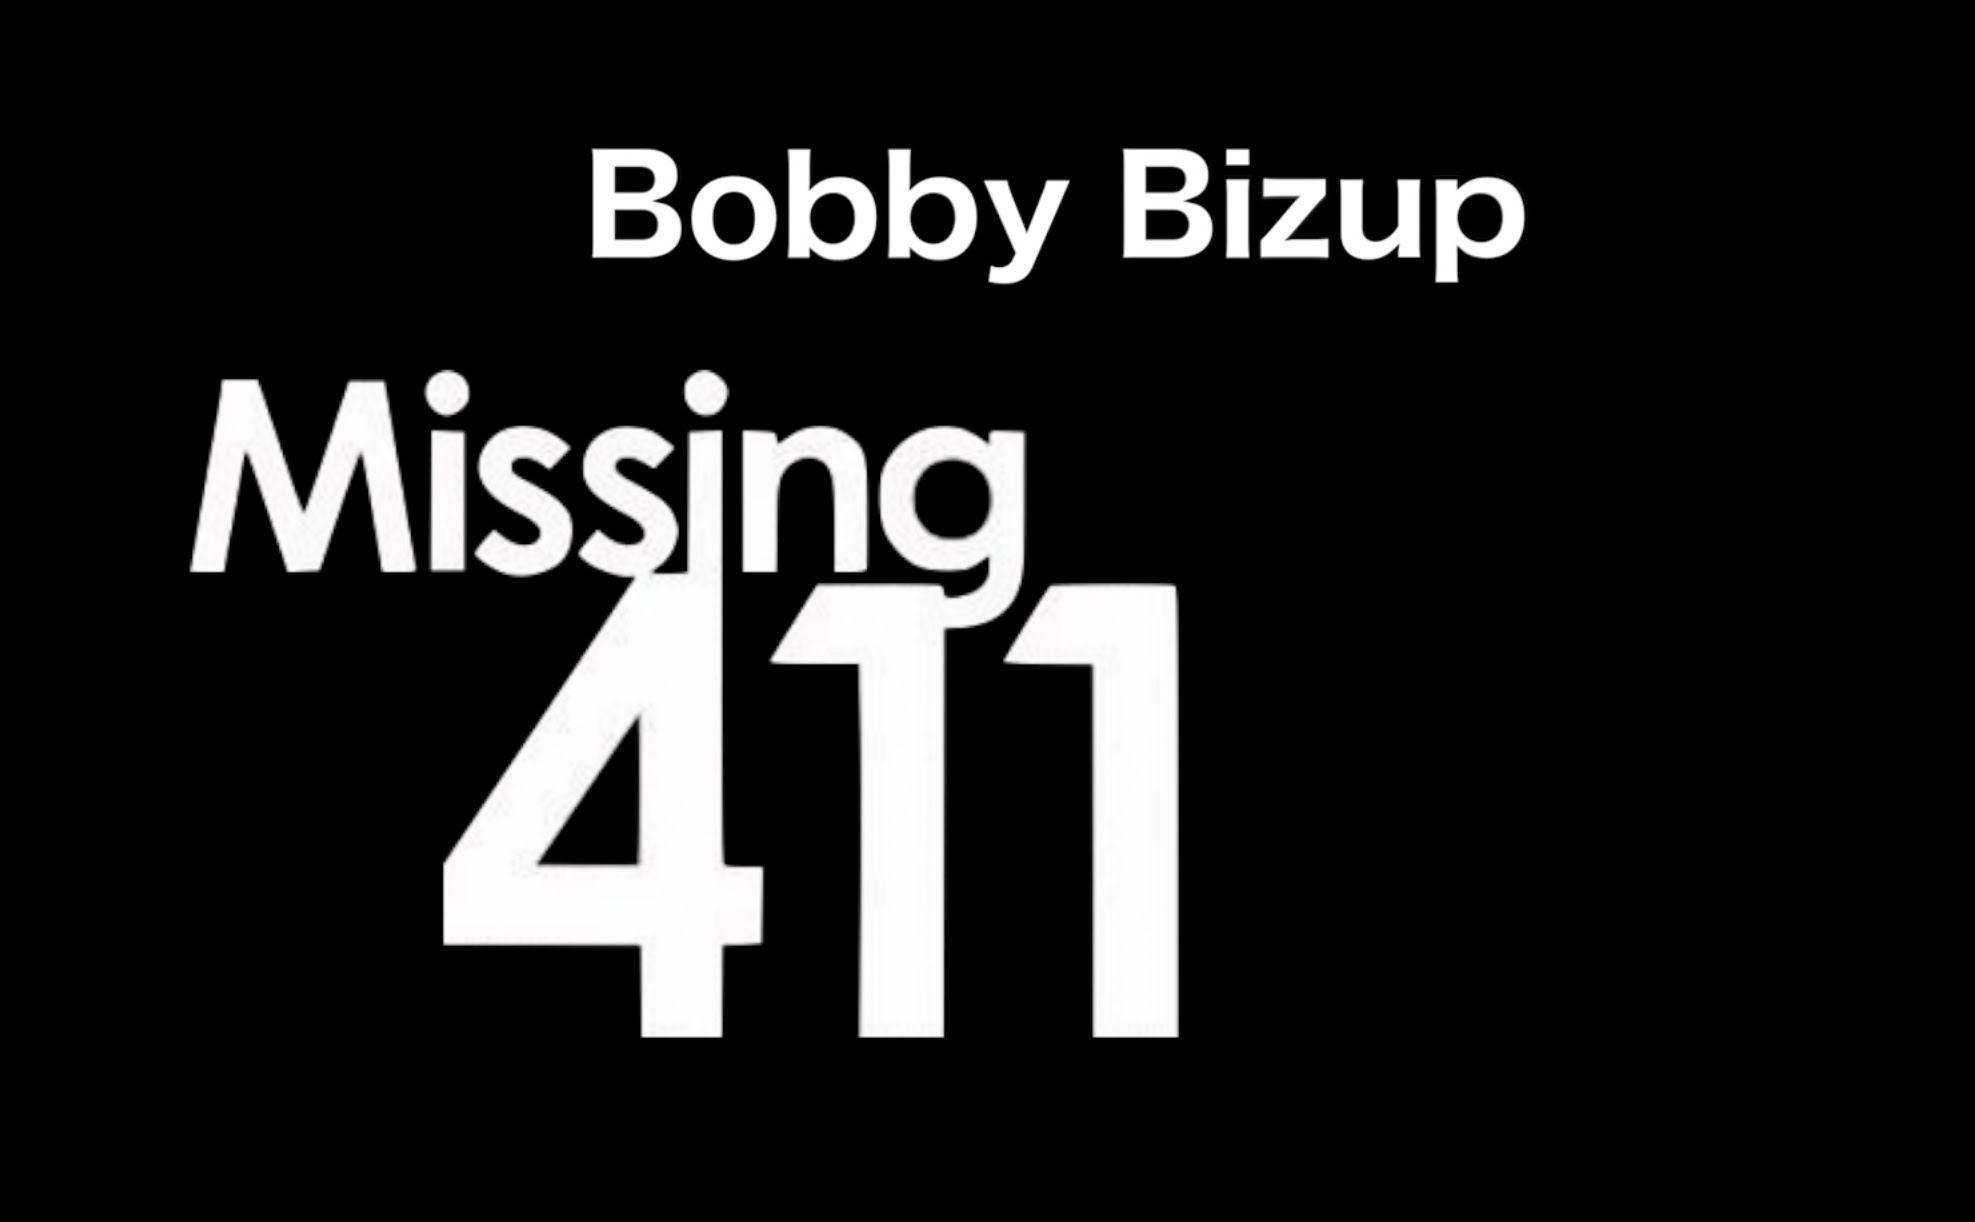 Missing 411 - Bobby Bizup   Bigfoot, Cold case, Paranormal